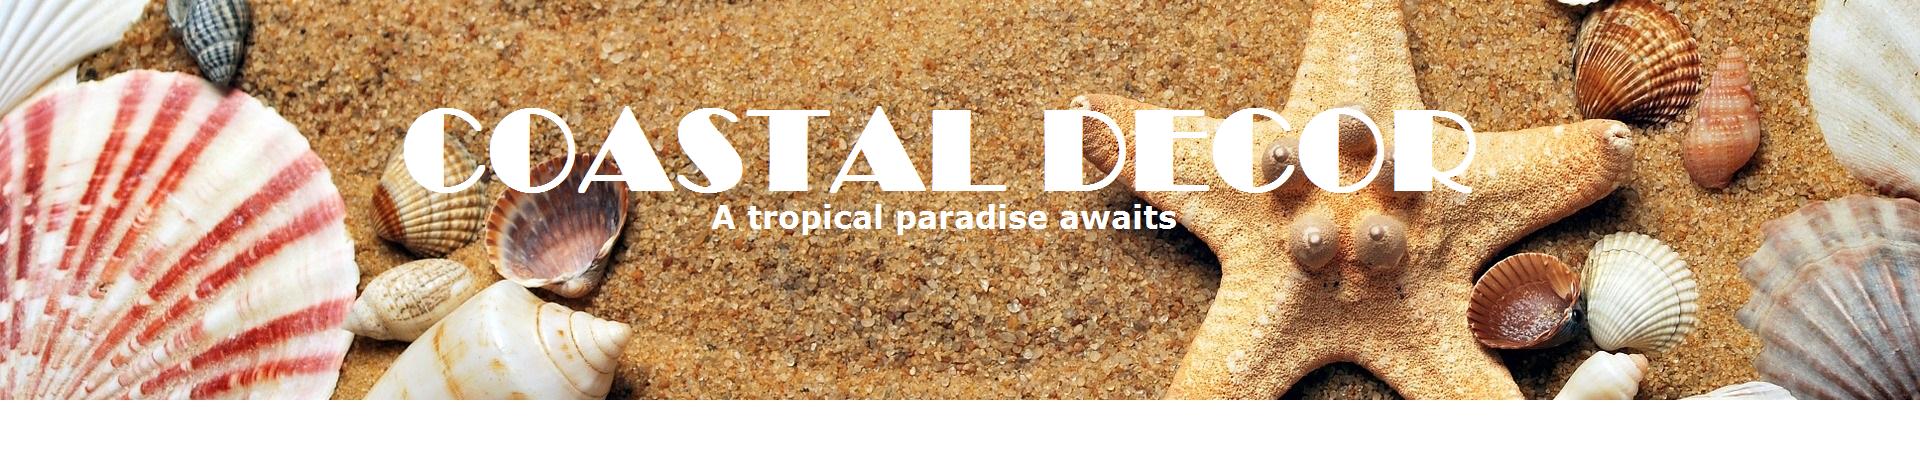 Coastal Tropical Decor